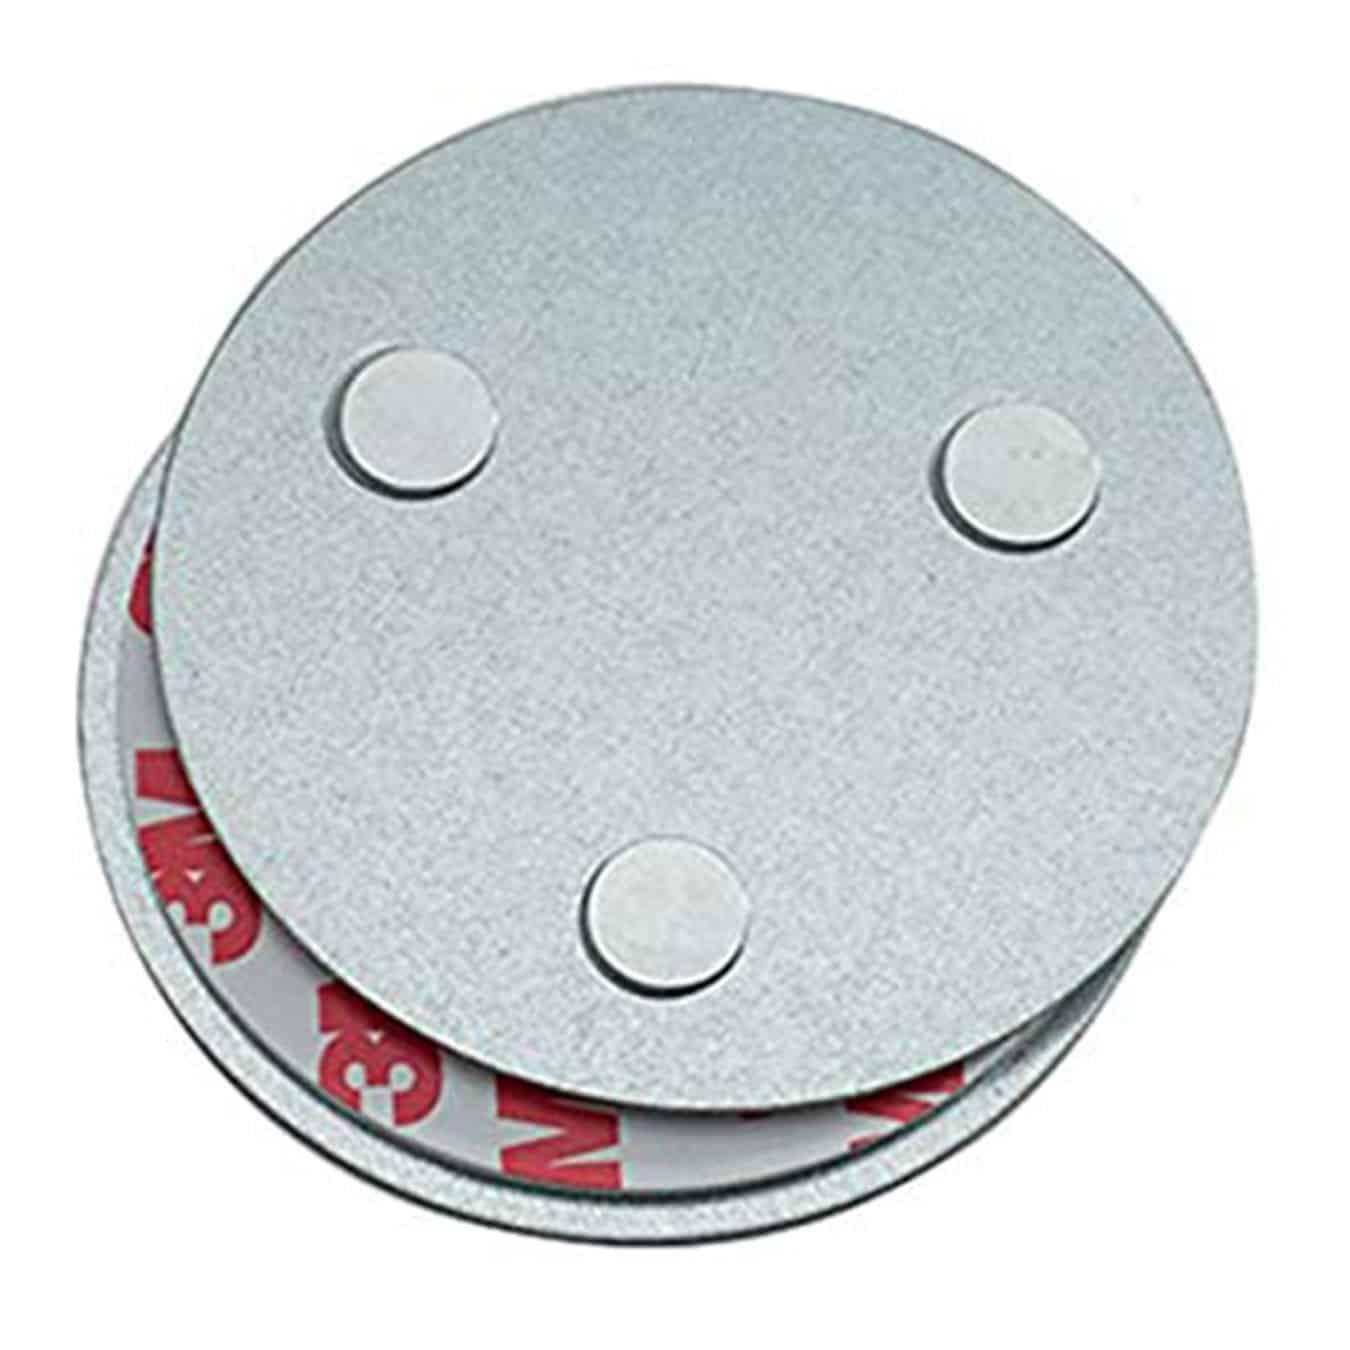 Koop Magnetische montageset R-MAG XXL - 70mm 3-pack